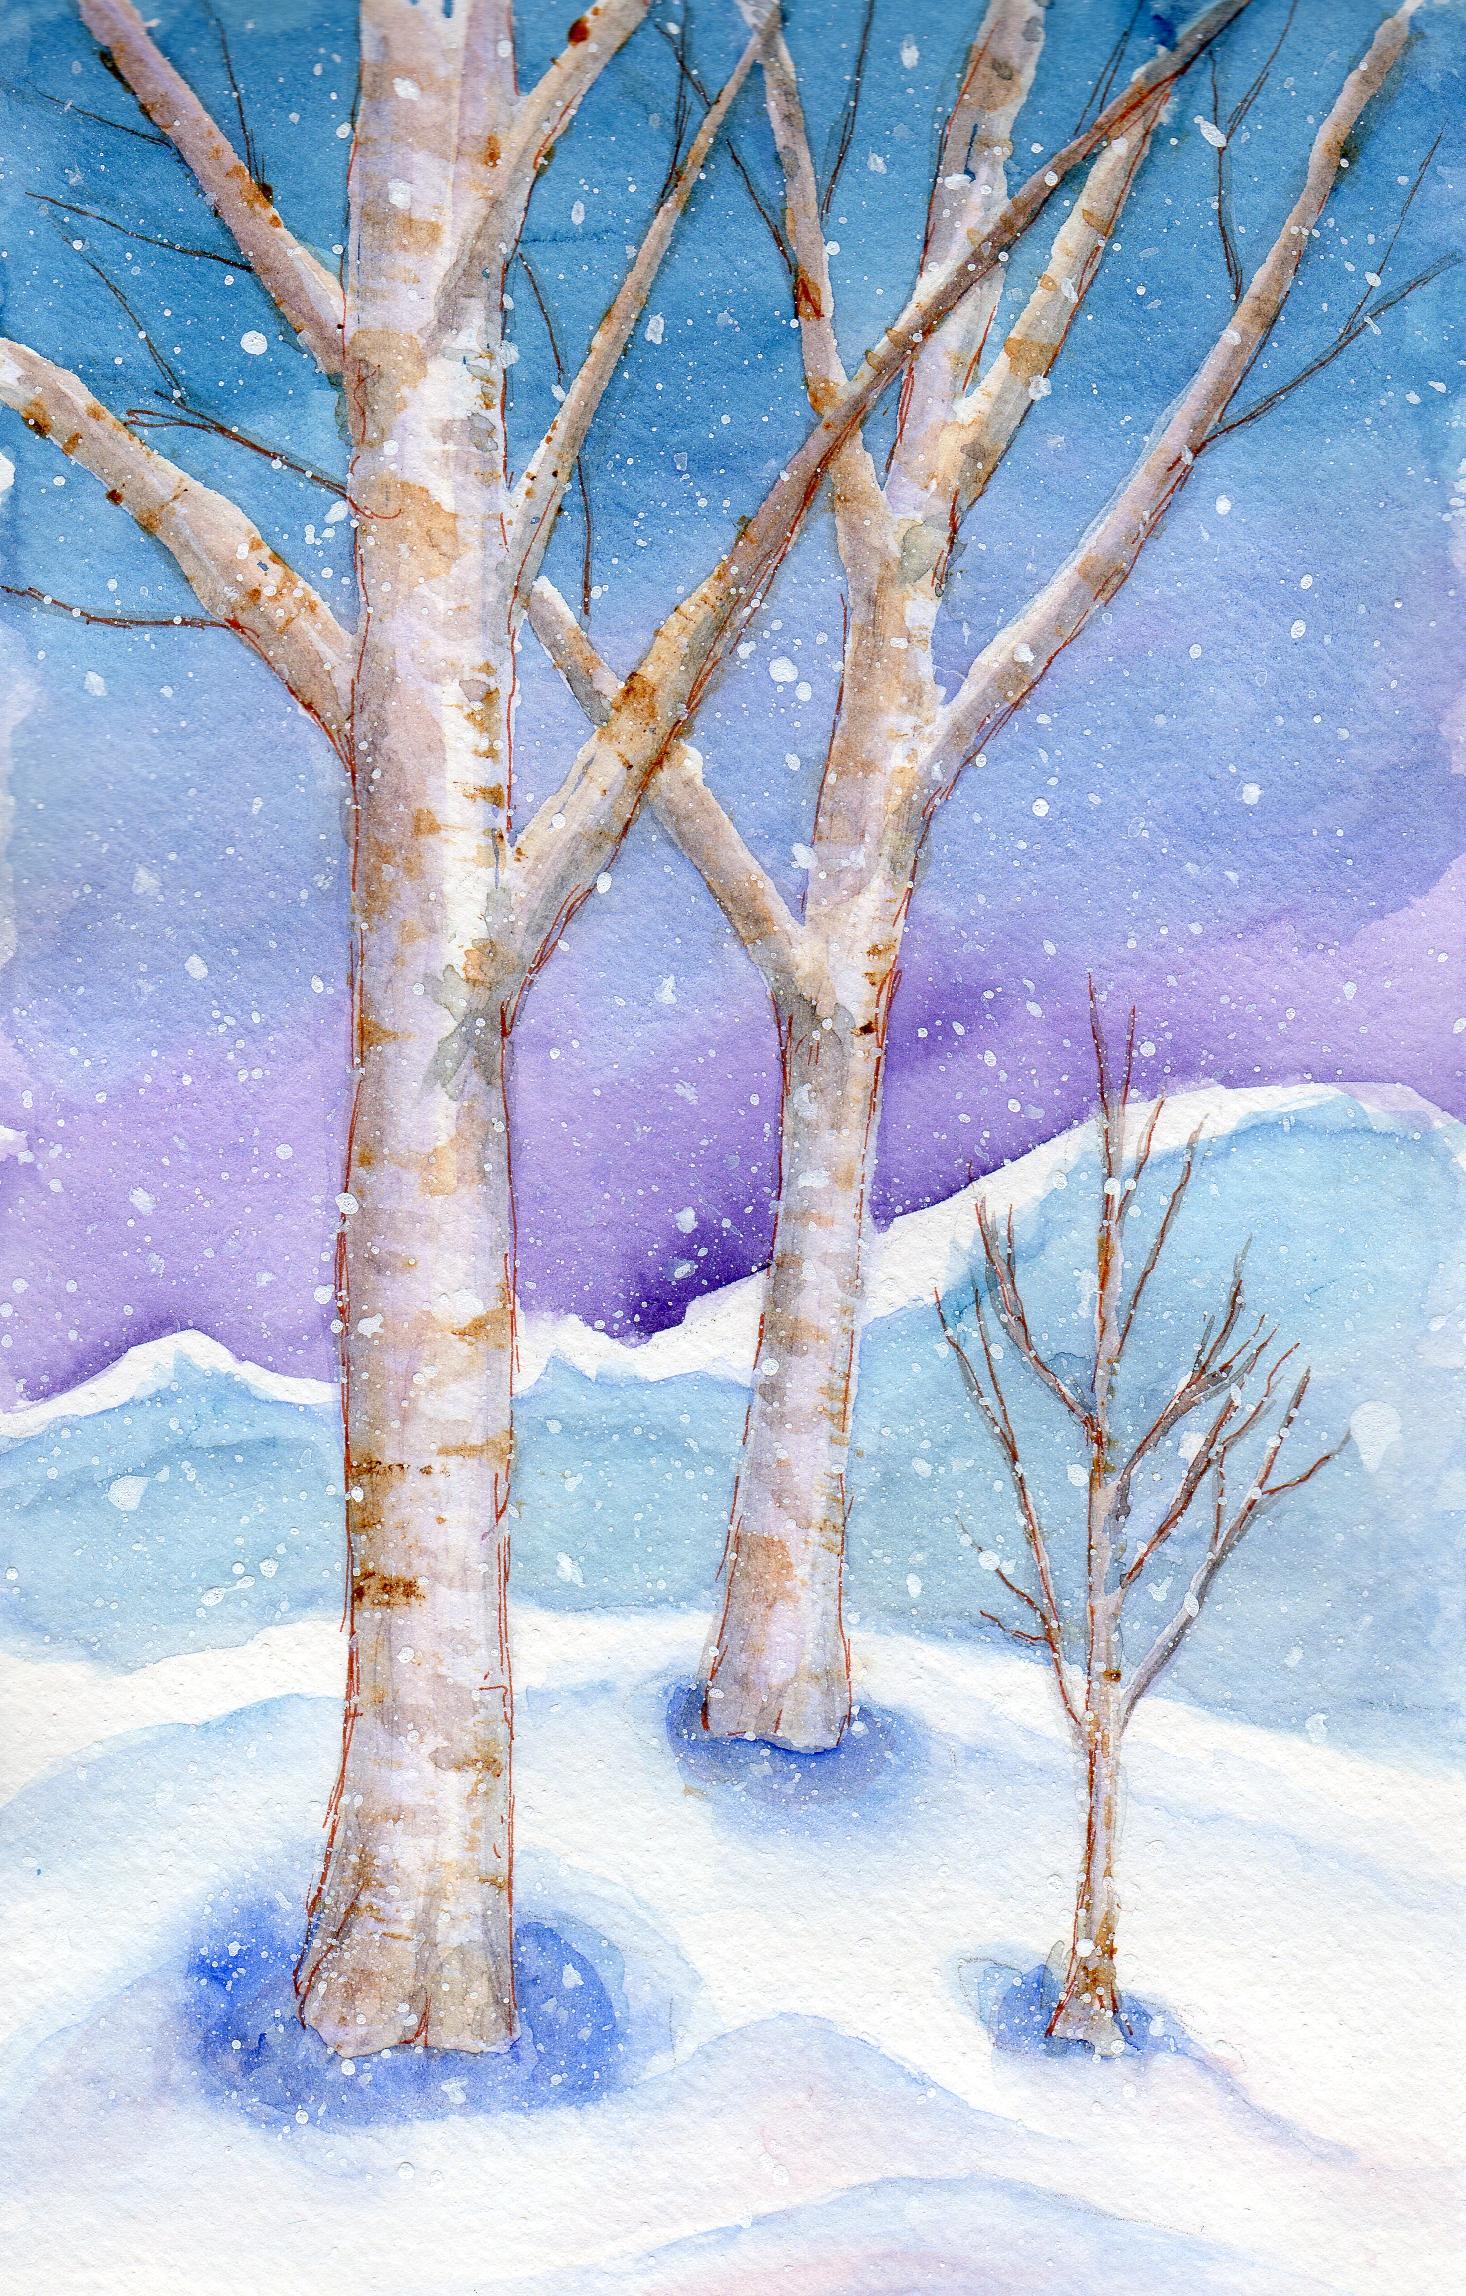 Snowy Birches by Elizabeth Oertel